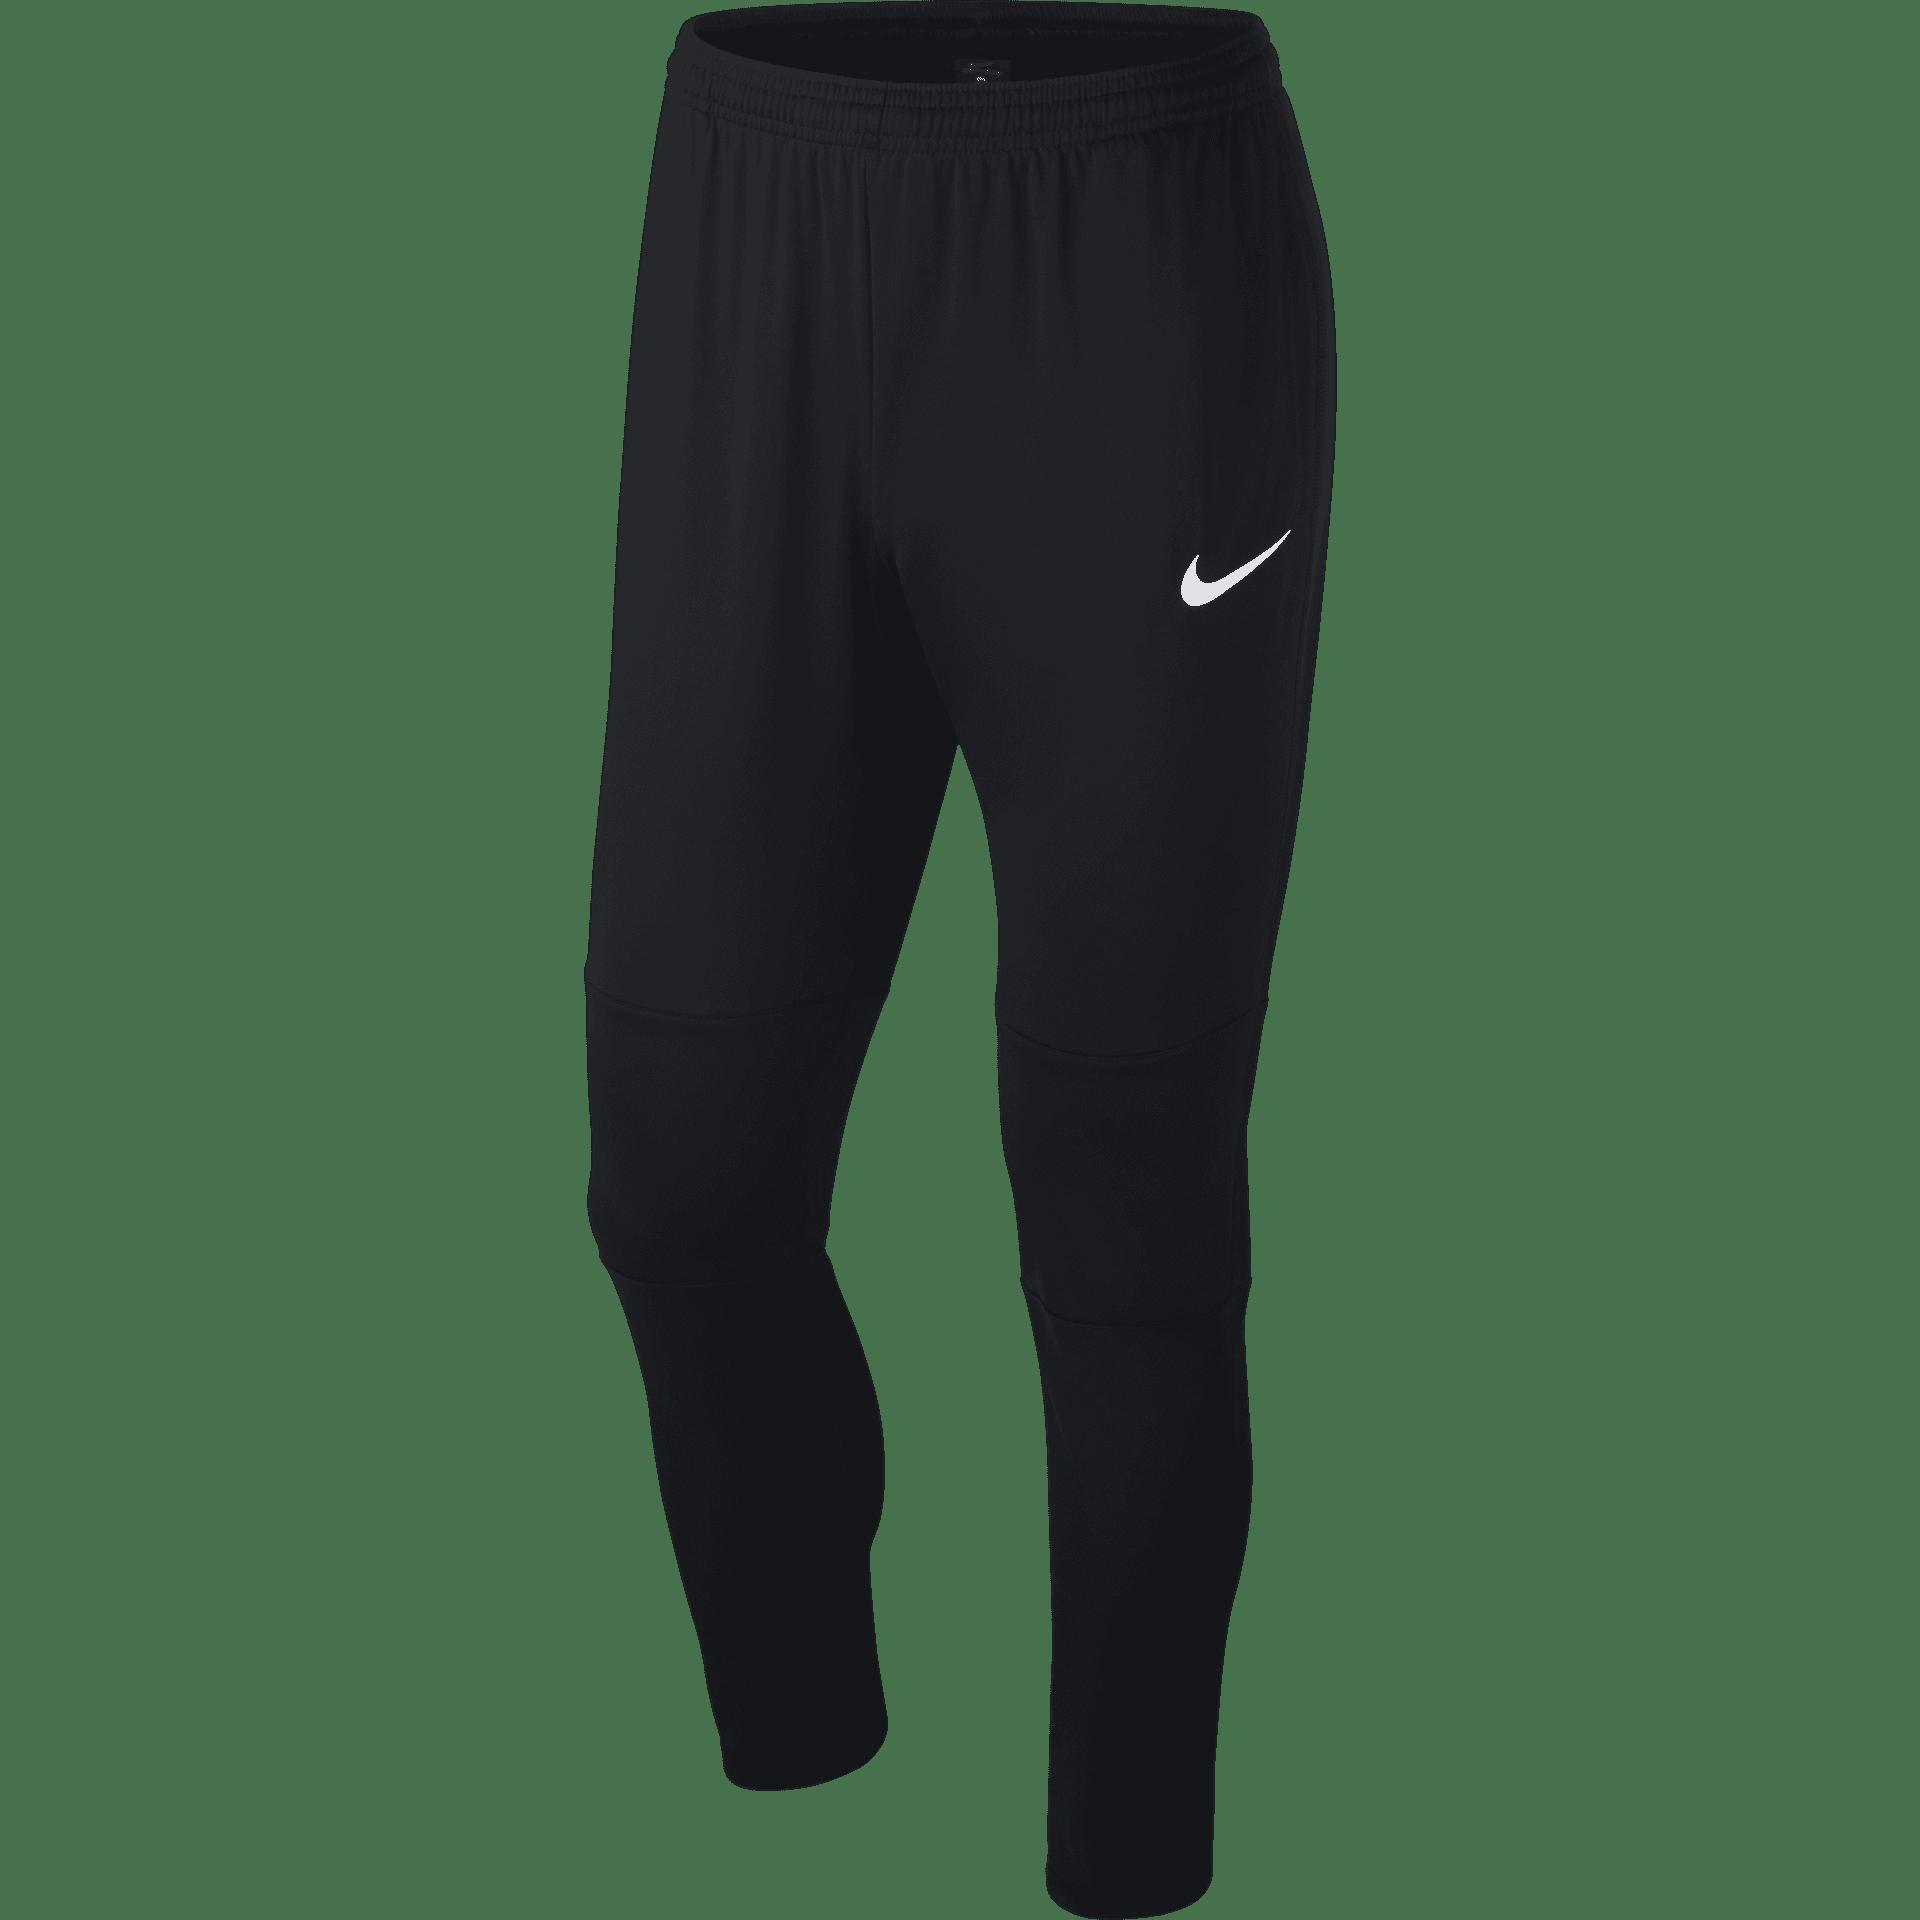 fivemiletown utd skinny pants 34353 p